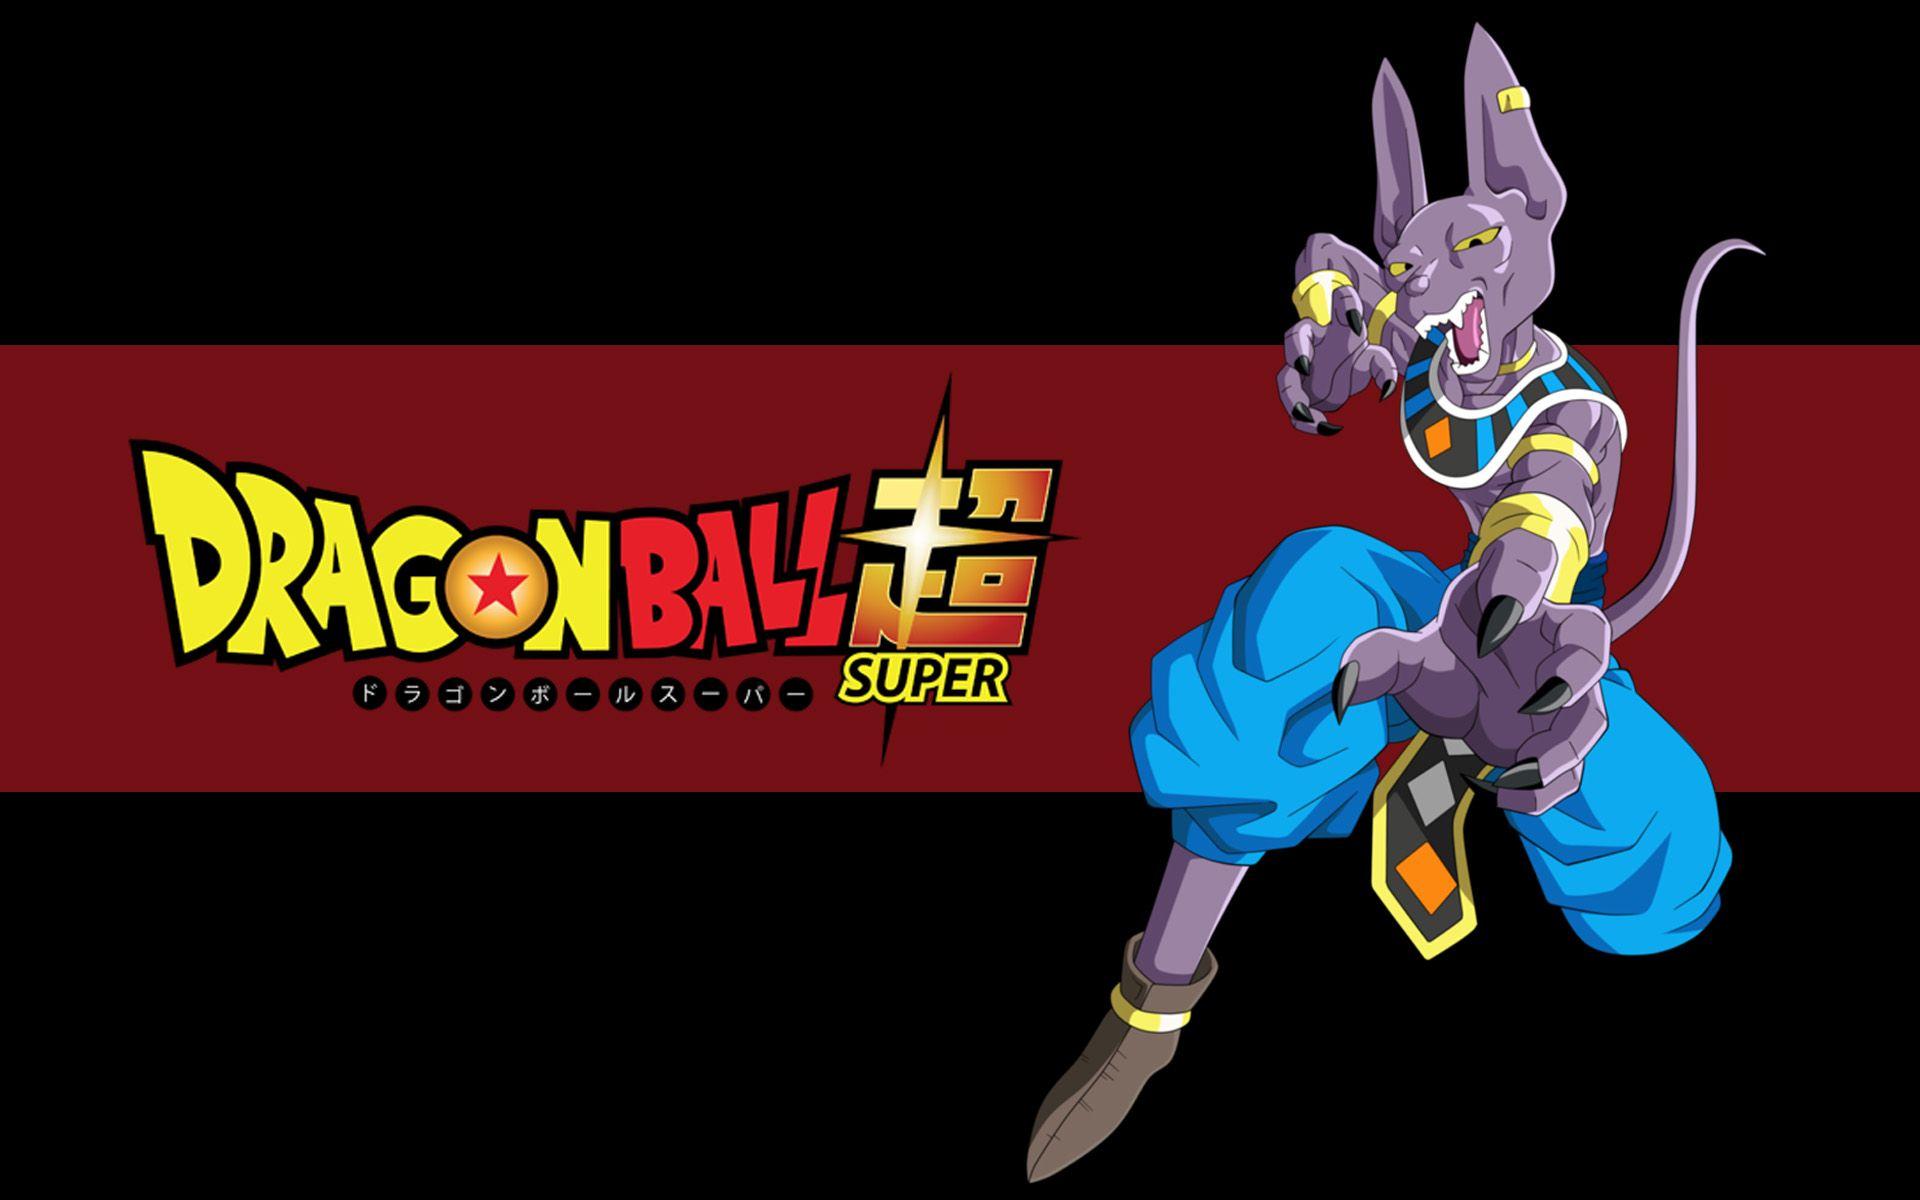 Dragon Ball Super Bills Wallpaper